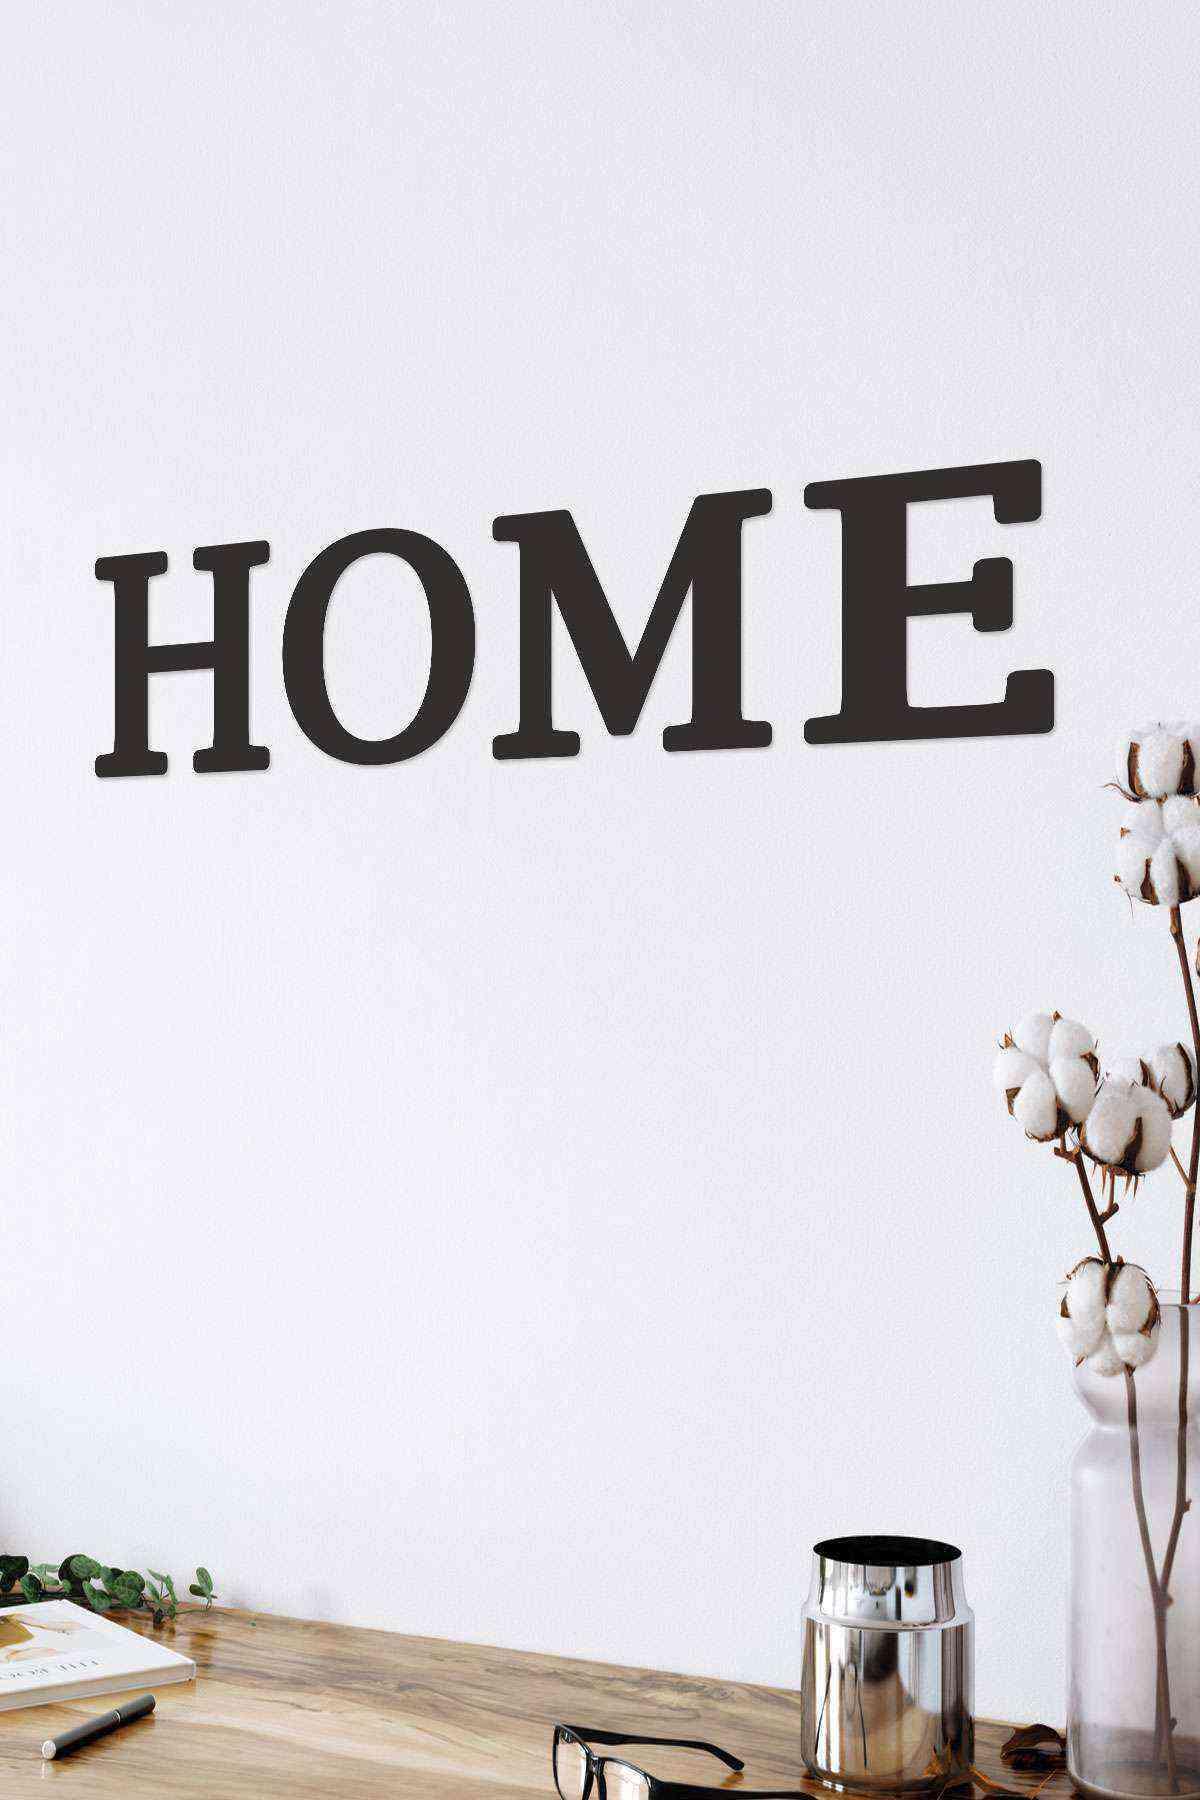 Home Yazısı 4 lü Duvar Dekoru Tablo Siyah Ahşap Mdf